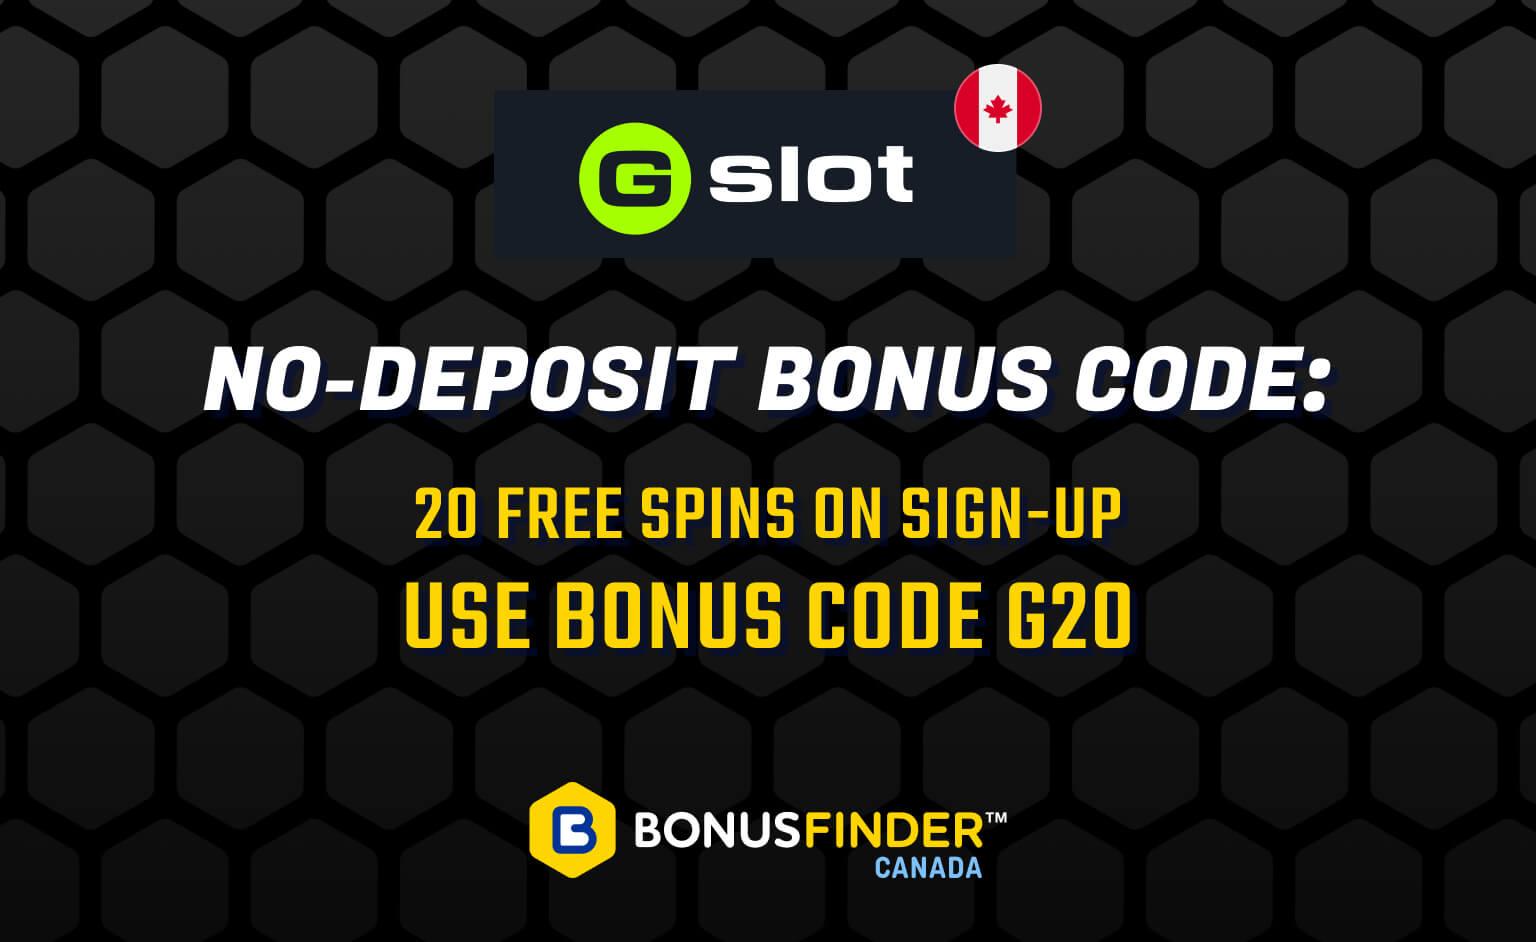 Gslot No-Deposit Bonus Code